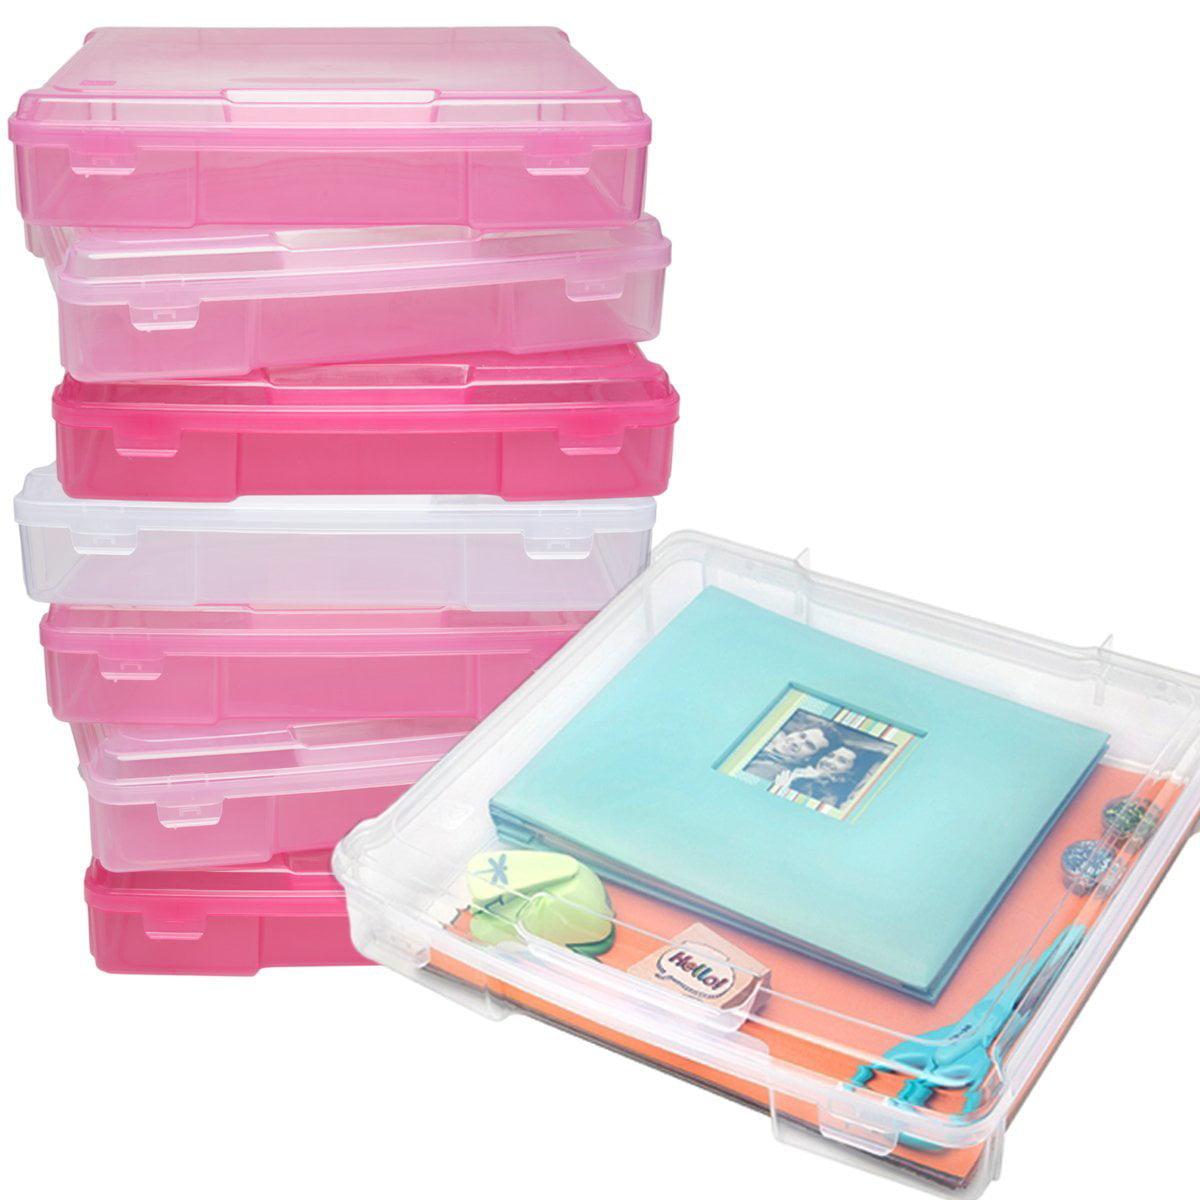 Iris 8 Pack Portable Scrapbooking Cases 12x12 Paper Supplies Storage